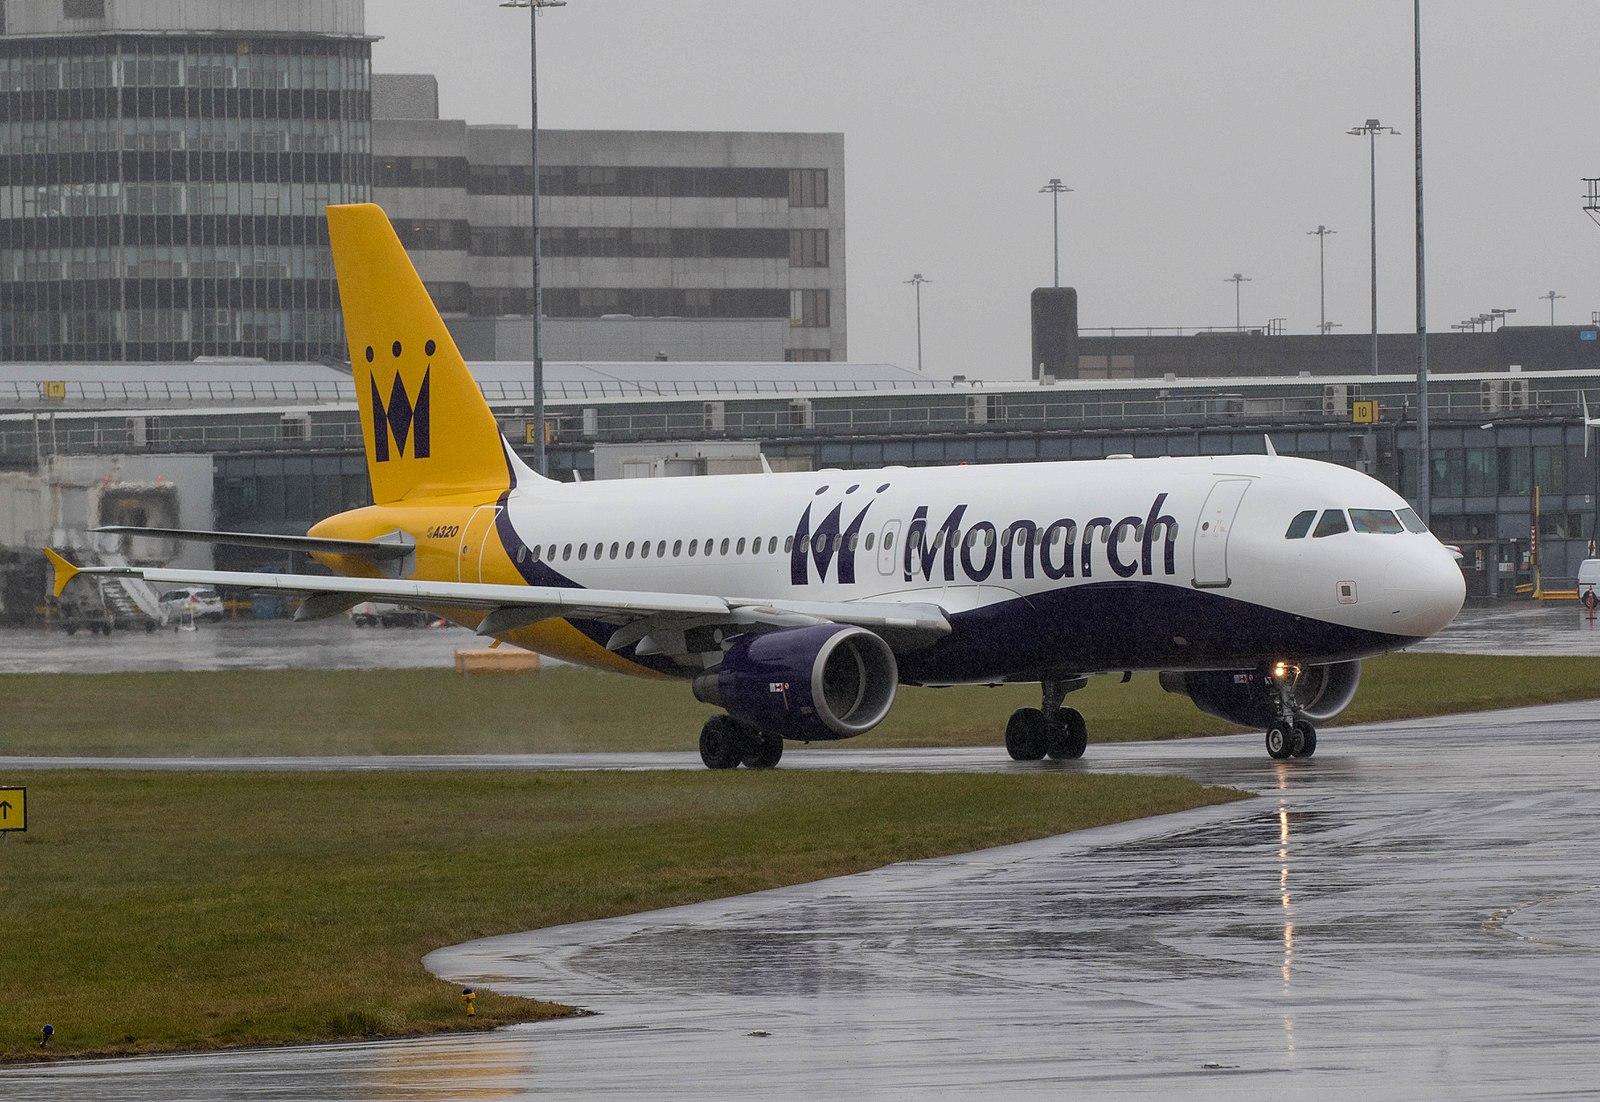 Crash Landings for the EU Airline Market